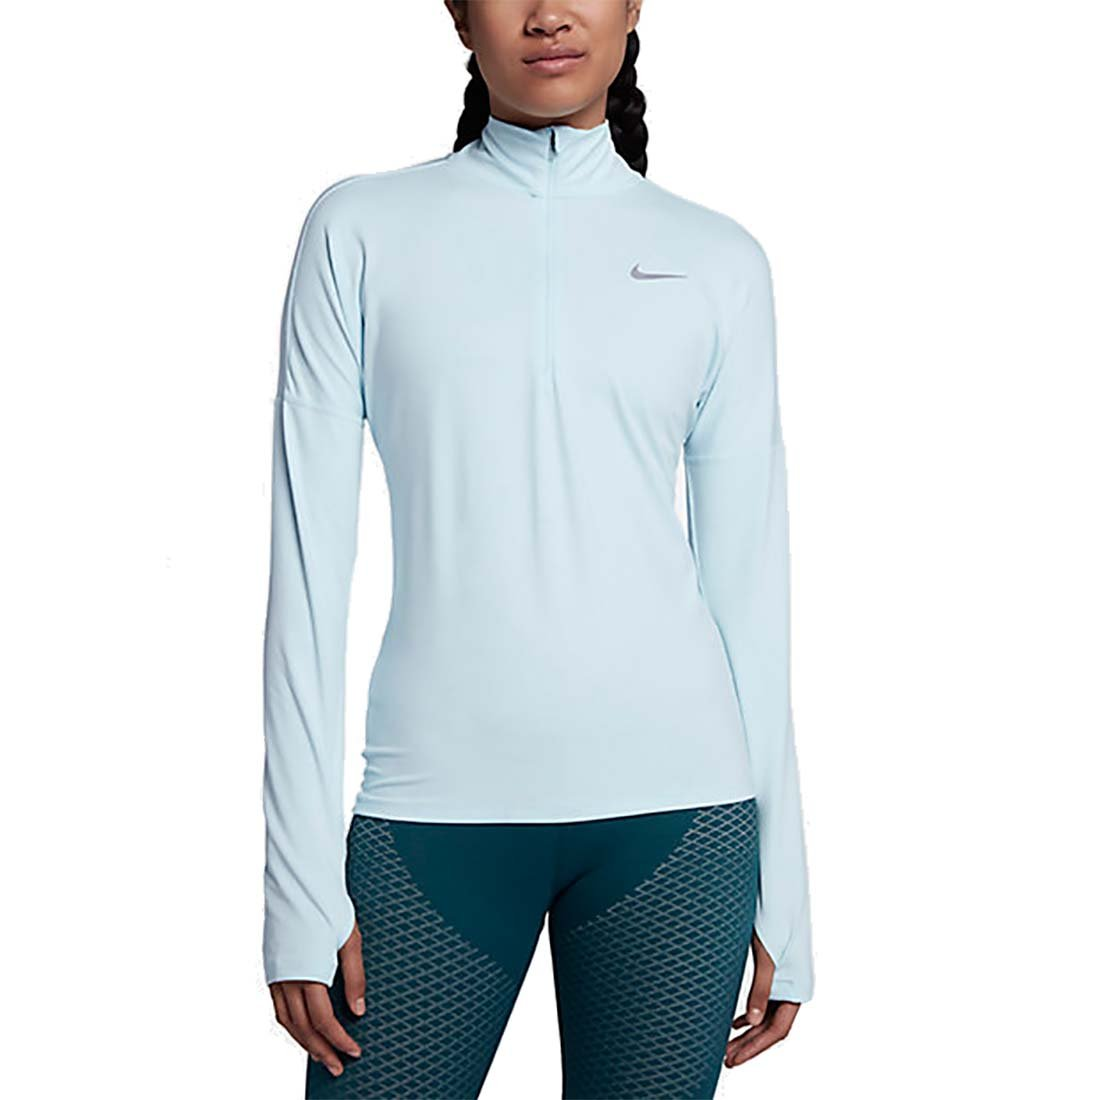 Nike Women's Dry Element Running Top GLACIER BLUE SM